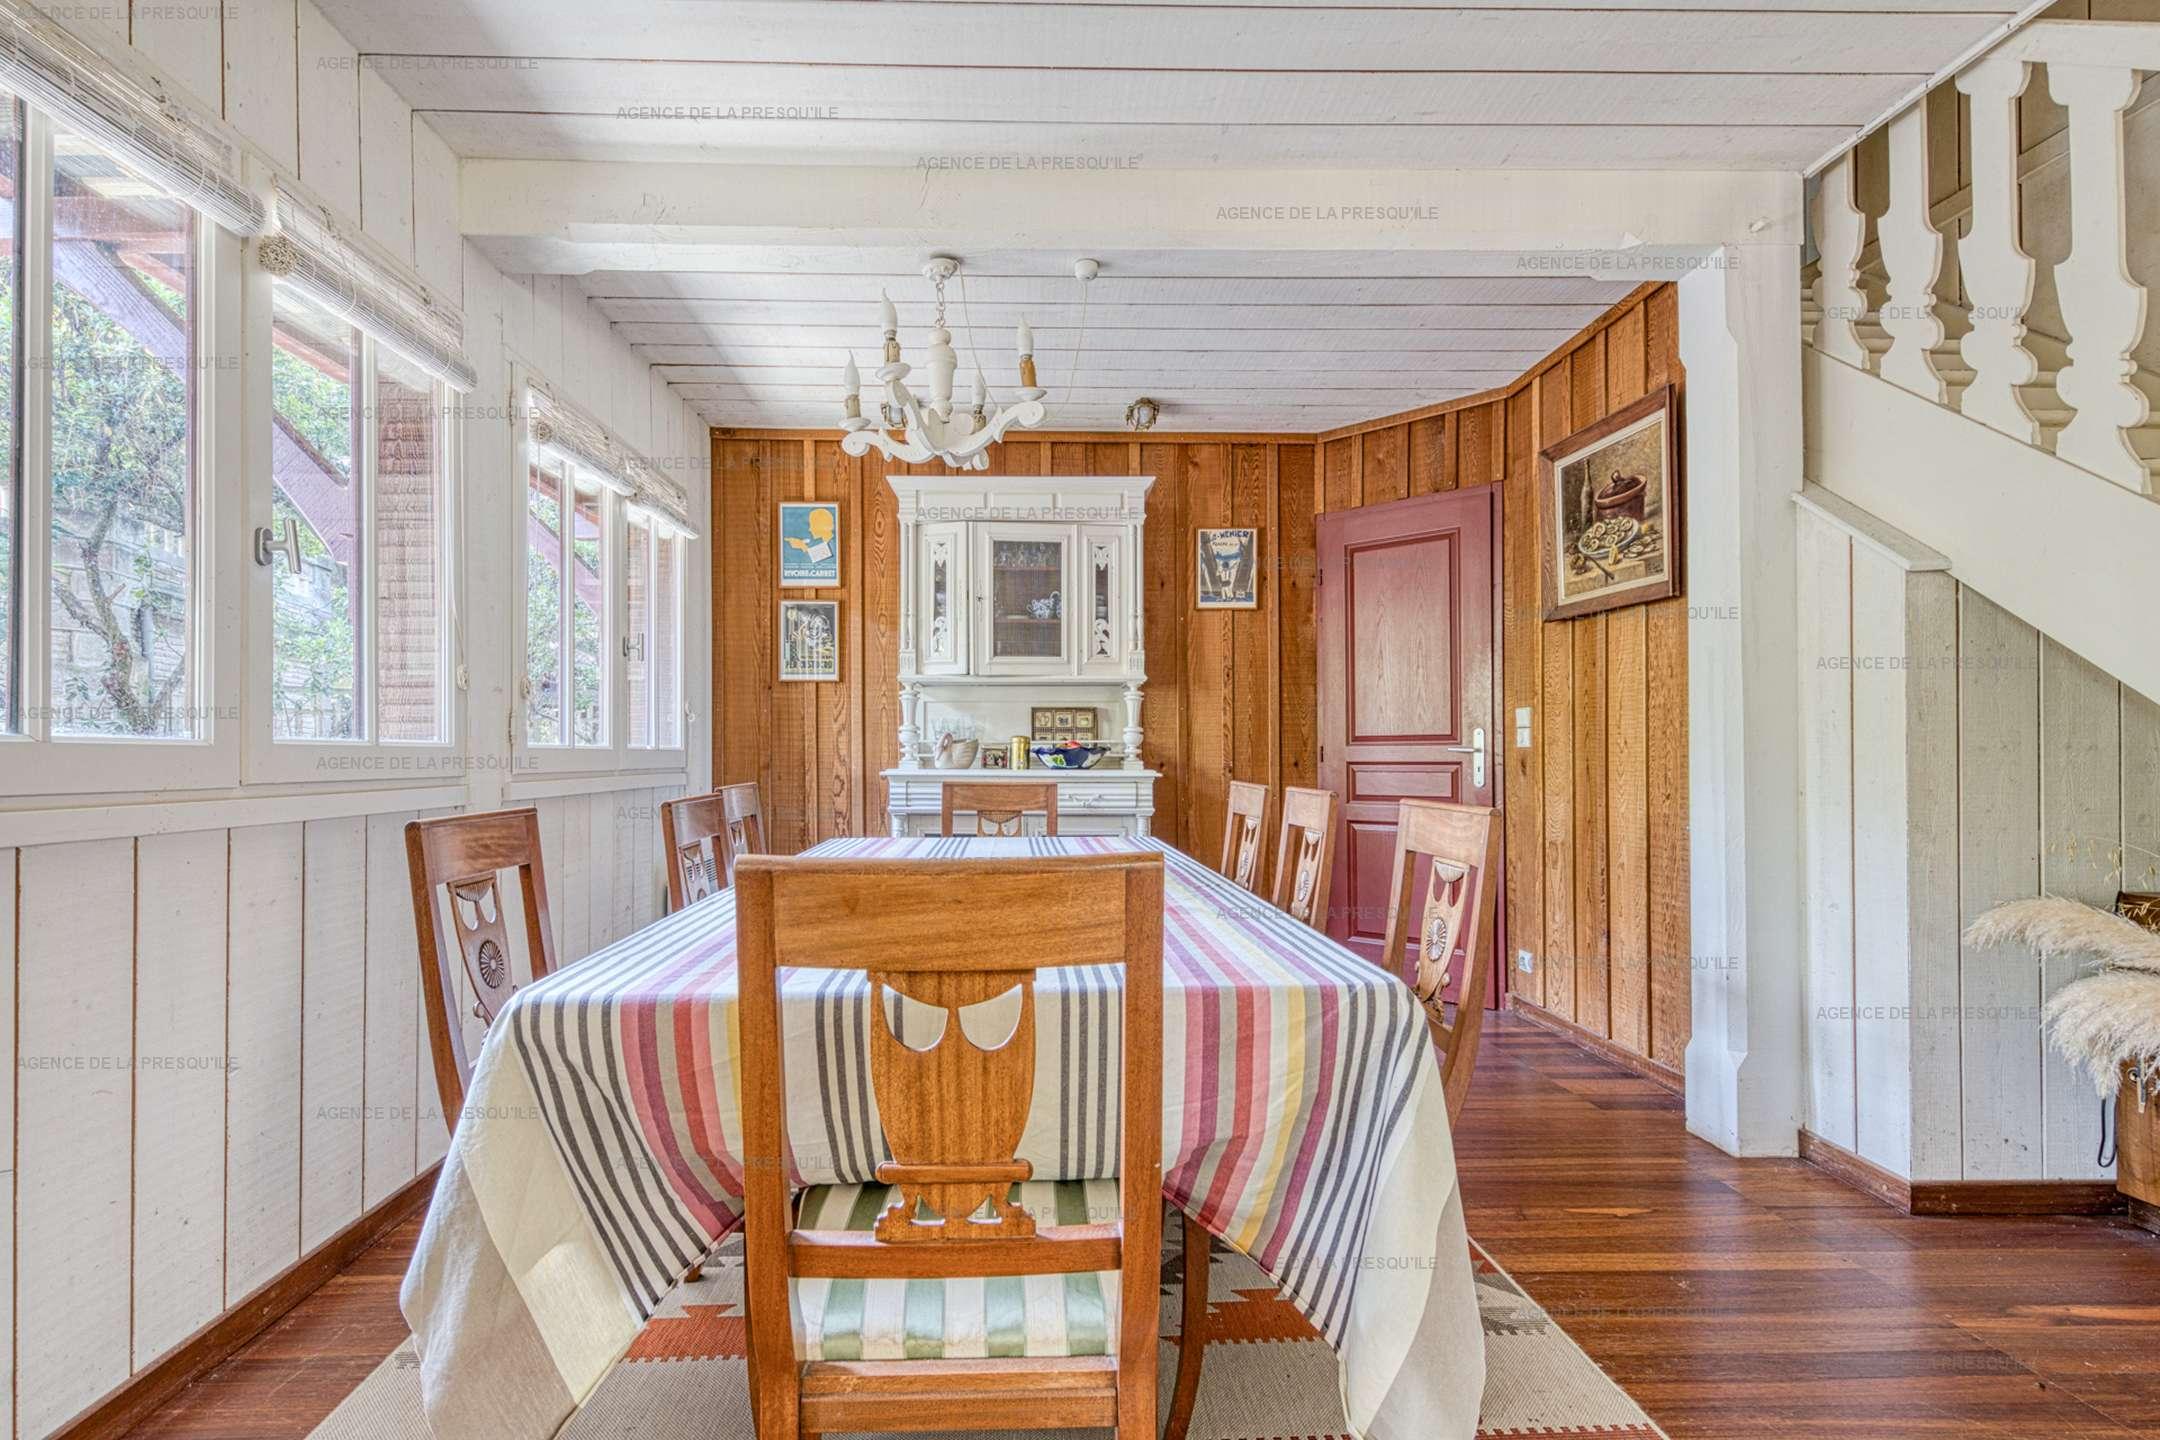 Location: villa en bois avec piscine 6